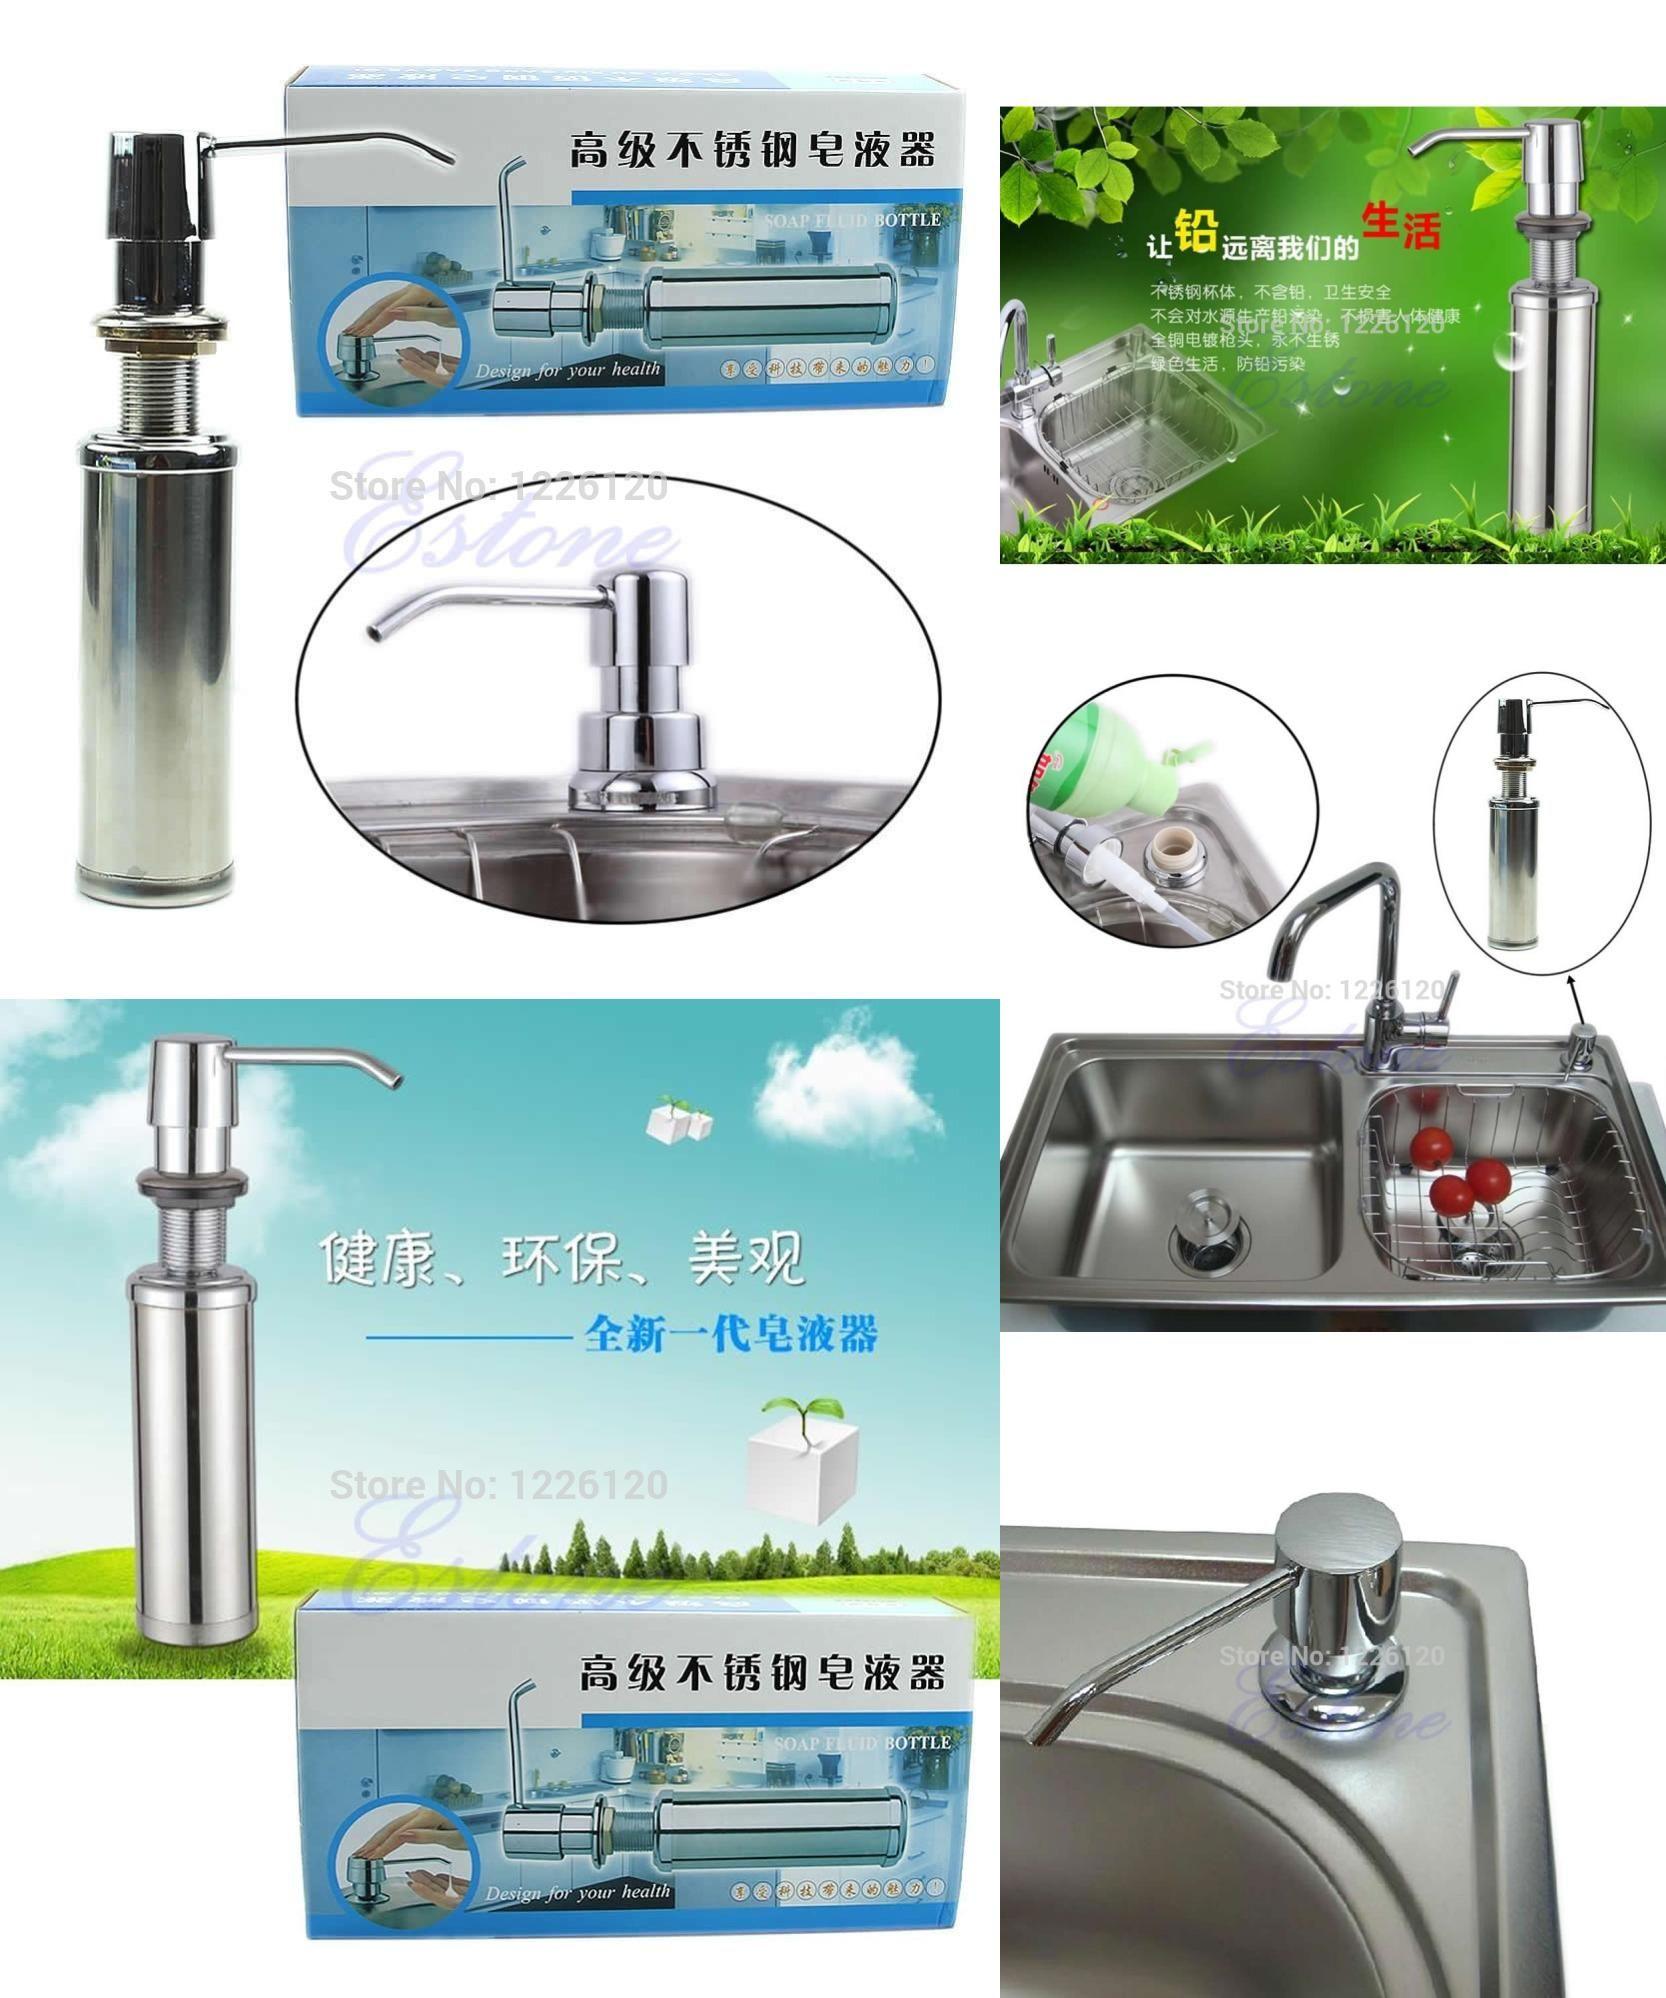 Visit to Buy] C18 200ML Soap Dispenser Kitchen Bathroom Sink Faucet ...